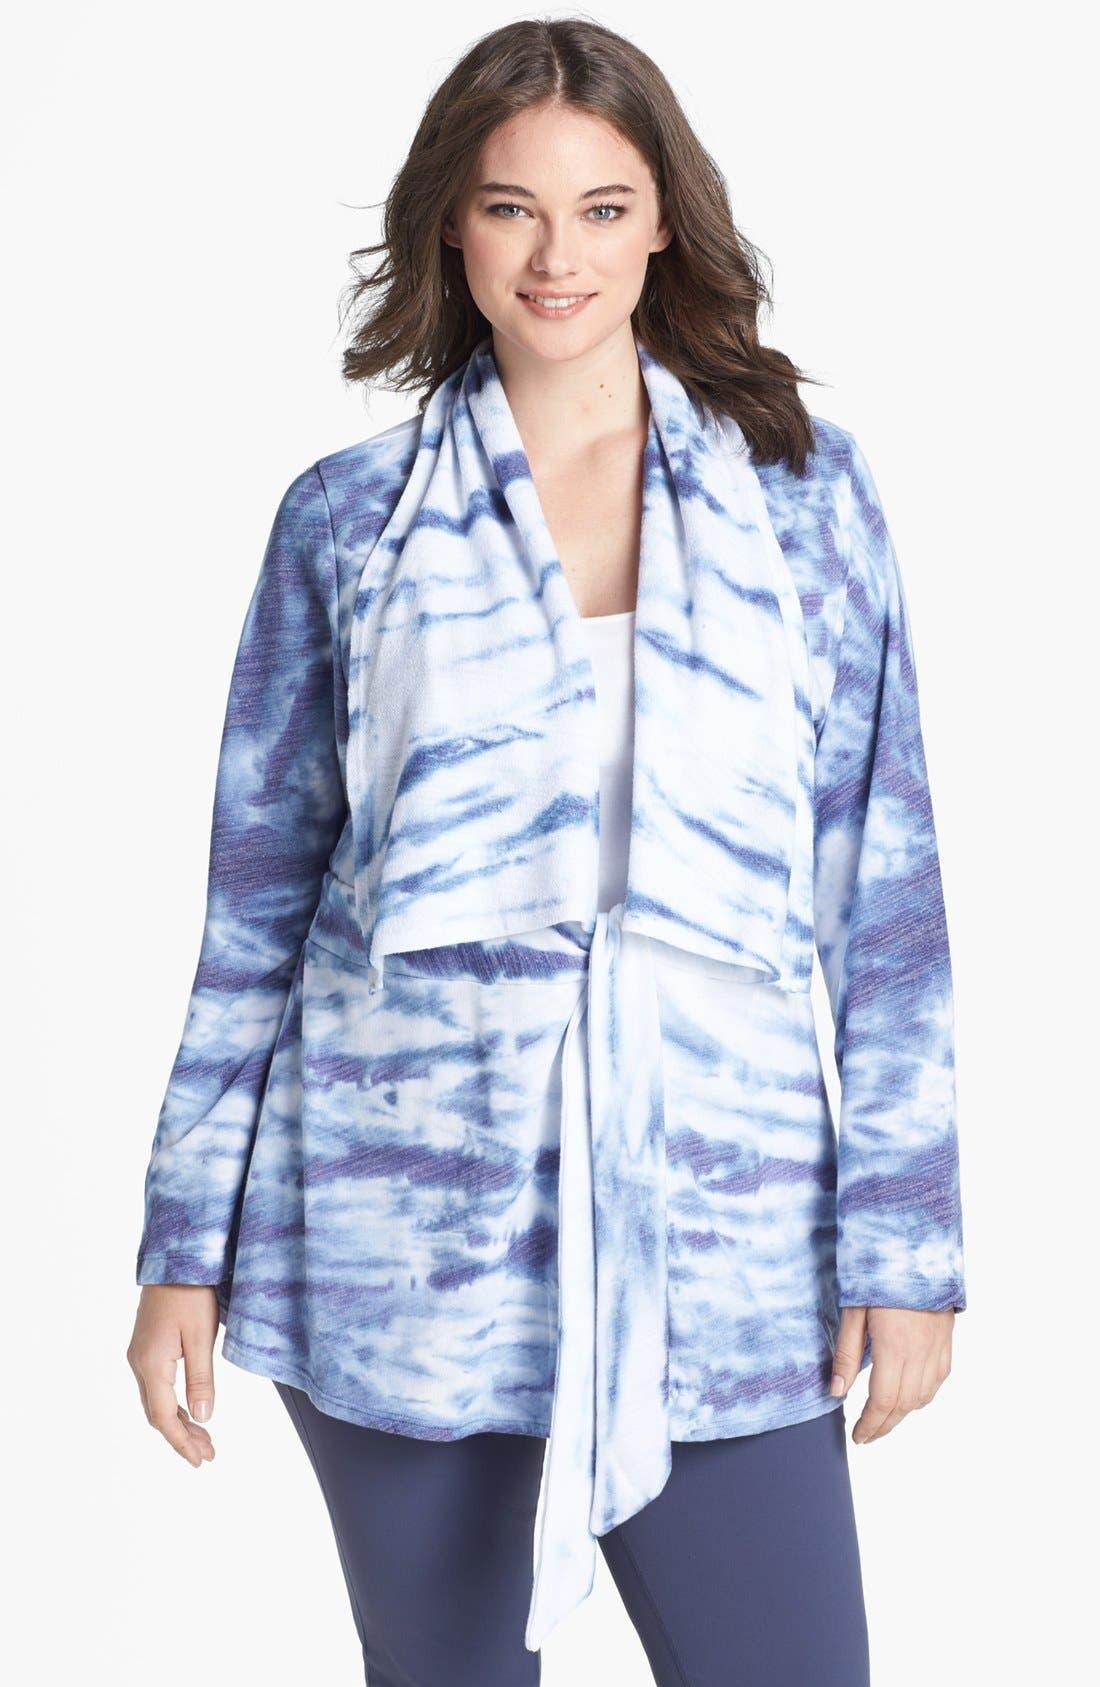 Alternate Image 1 Selected - Pink Lotus 'Tied & True' Wrap Cardigan (Plus Size)